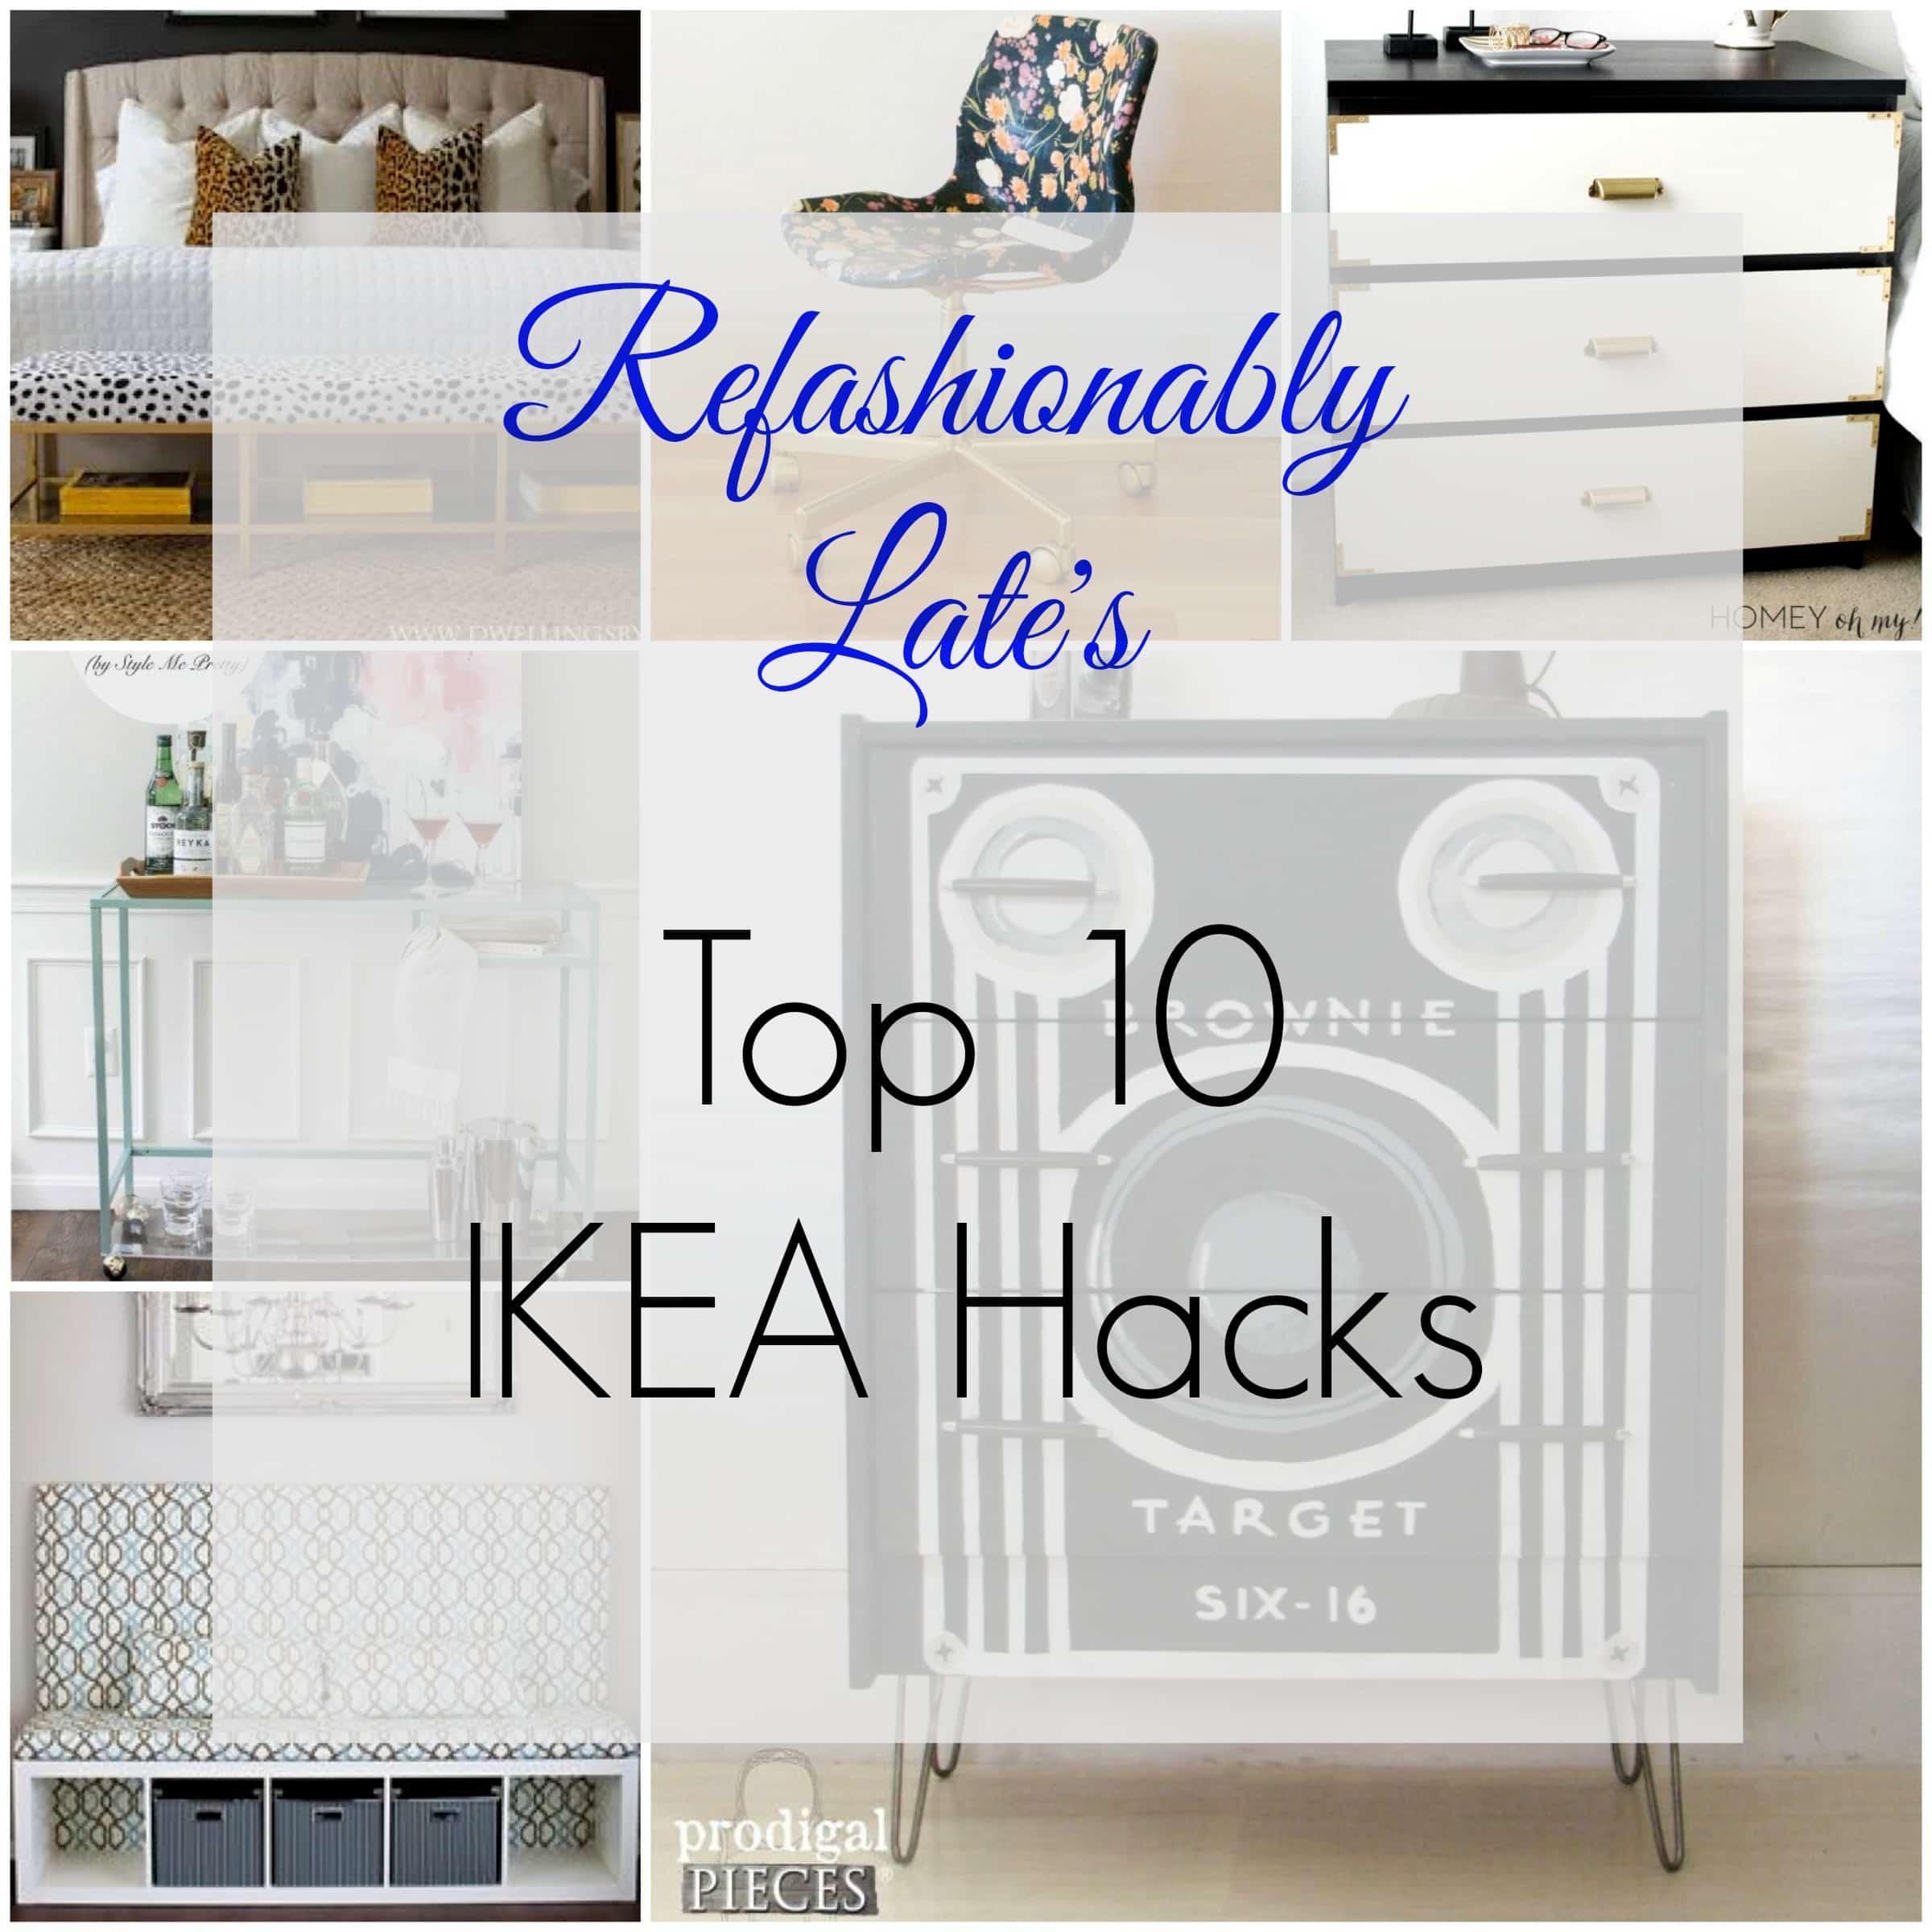 Friday Favorite Top 10 Ikea Hacks Refashionably Late